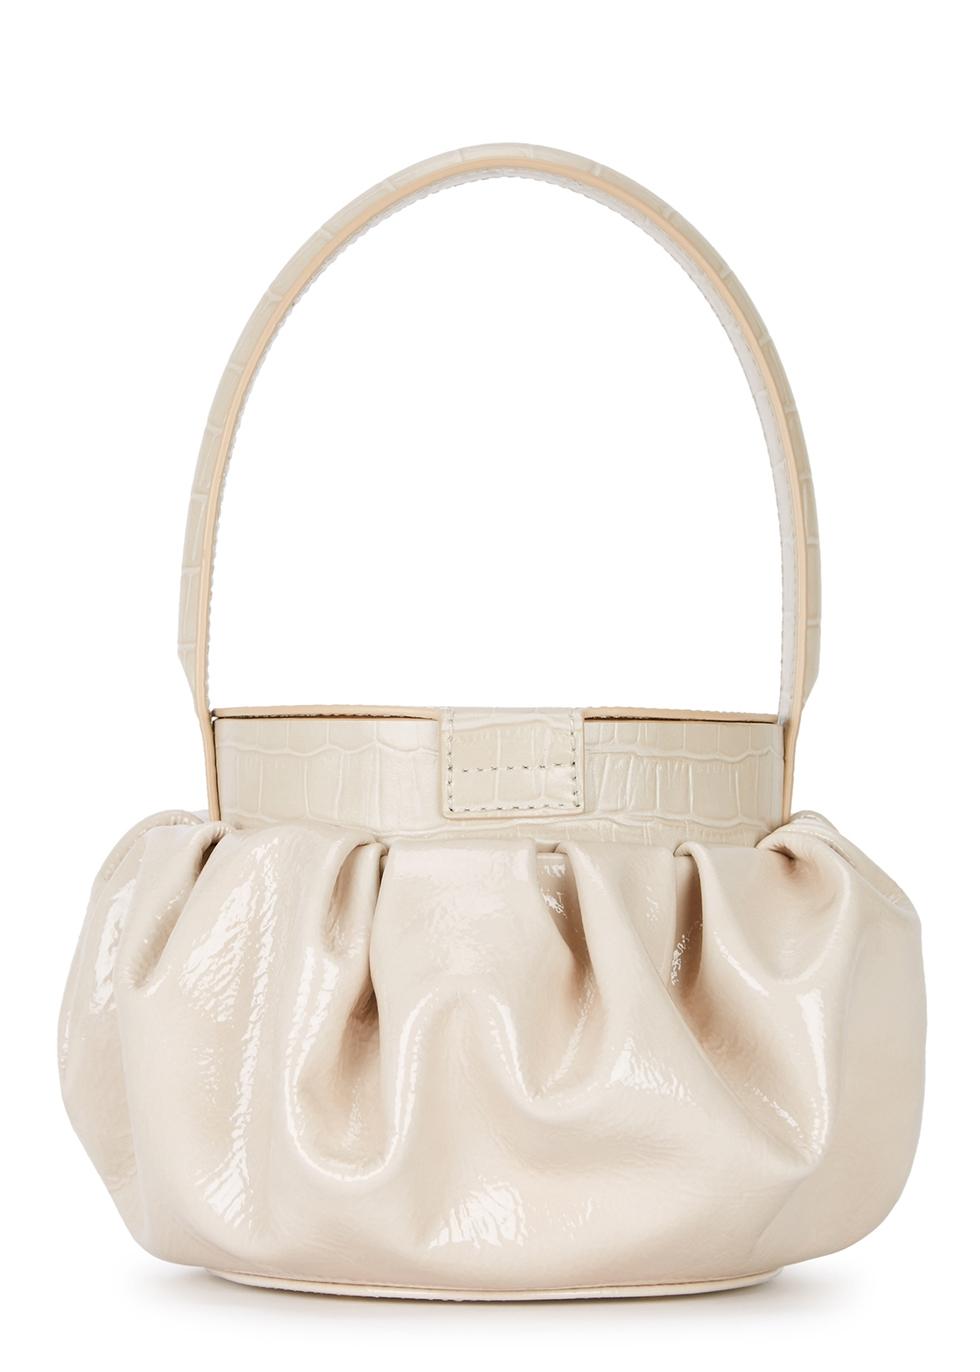 Agnes patent ivory leather top-handle bag - Rejina Pyo